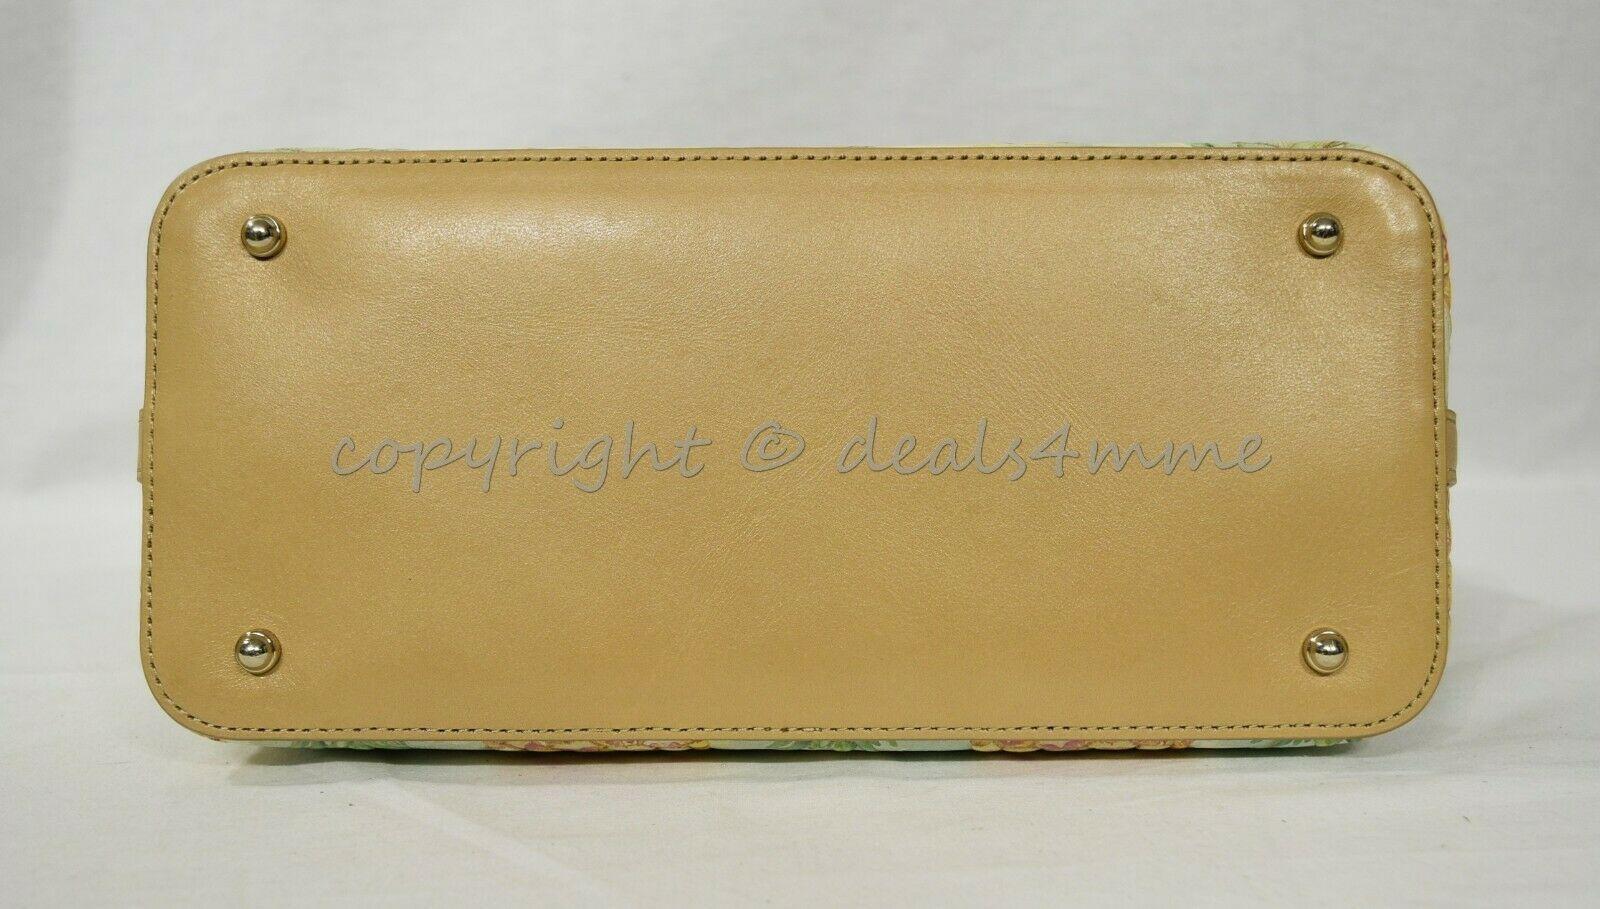 NWT Brahmin Duxbury Leather Satchel/Shoulder Bag in Multi Pompano image 11